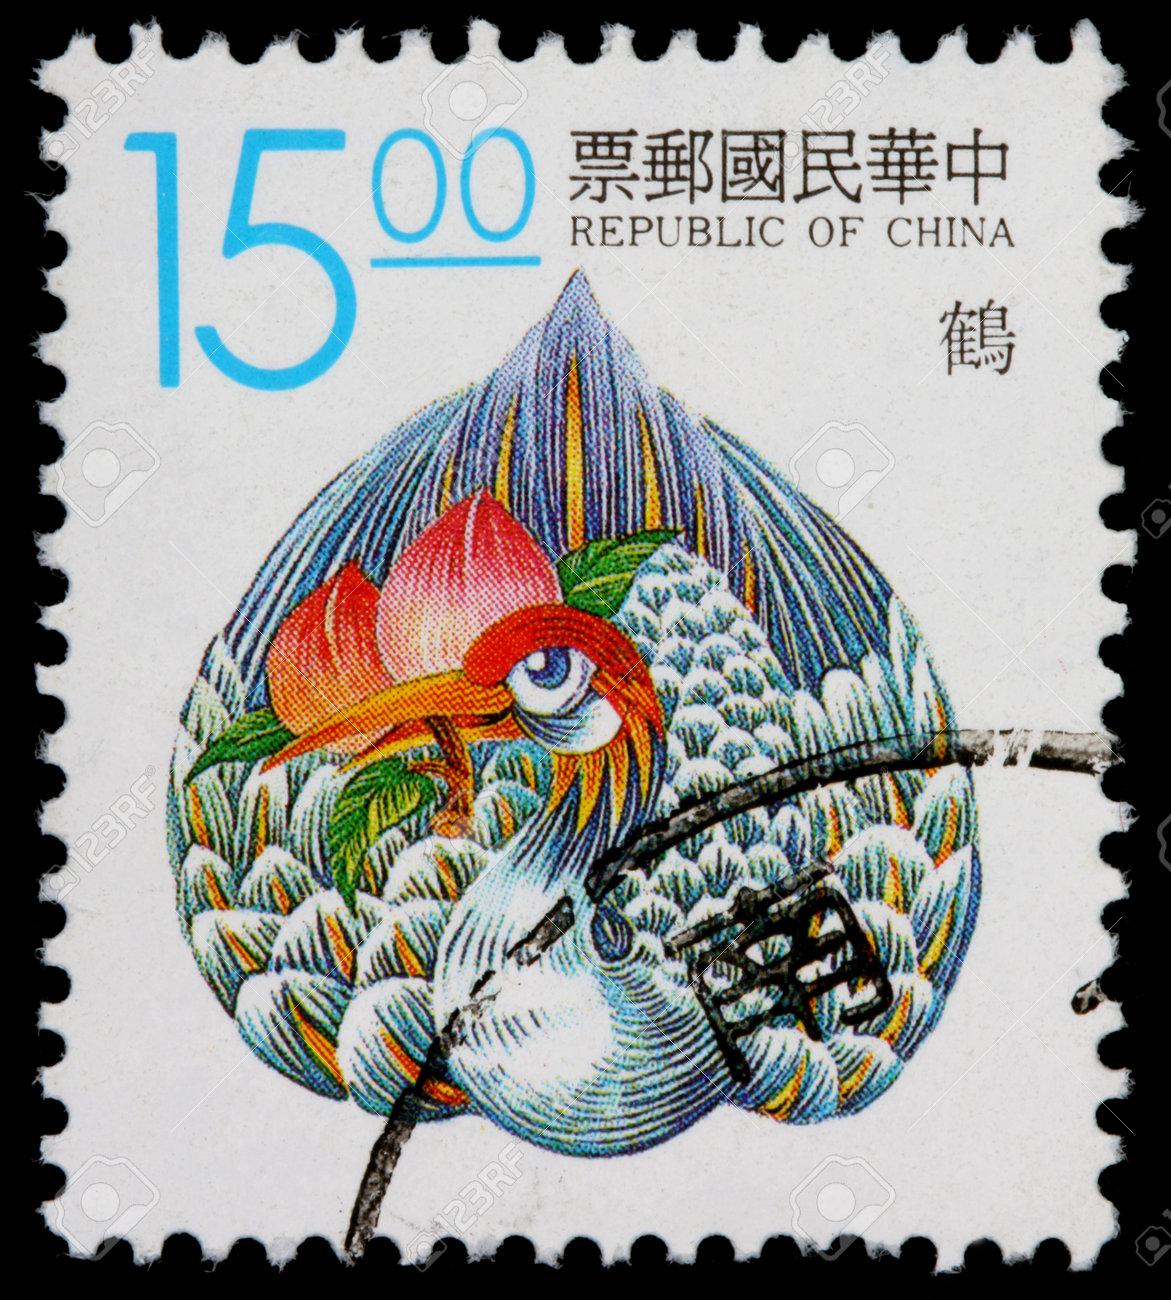 REPUBLIC OF CHINA (TAIWAN) - CIRCA 1990: A 15-dollar stamp printed